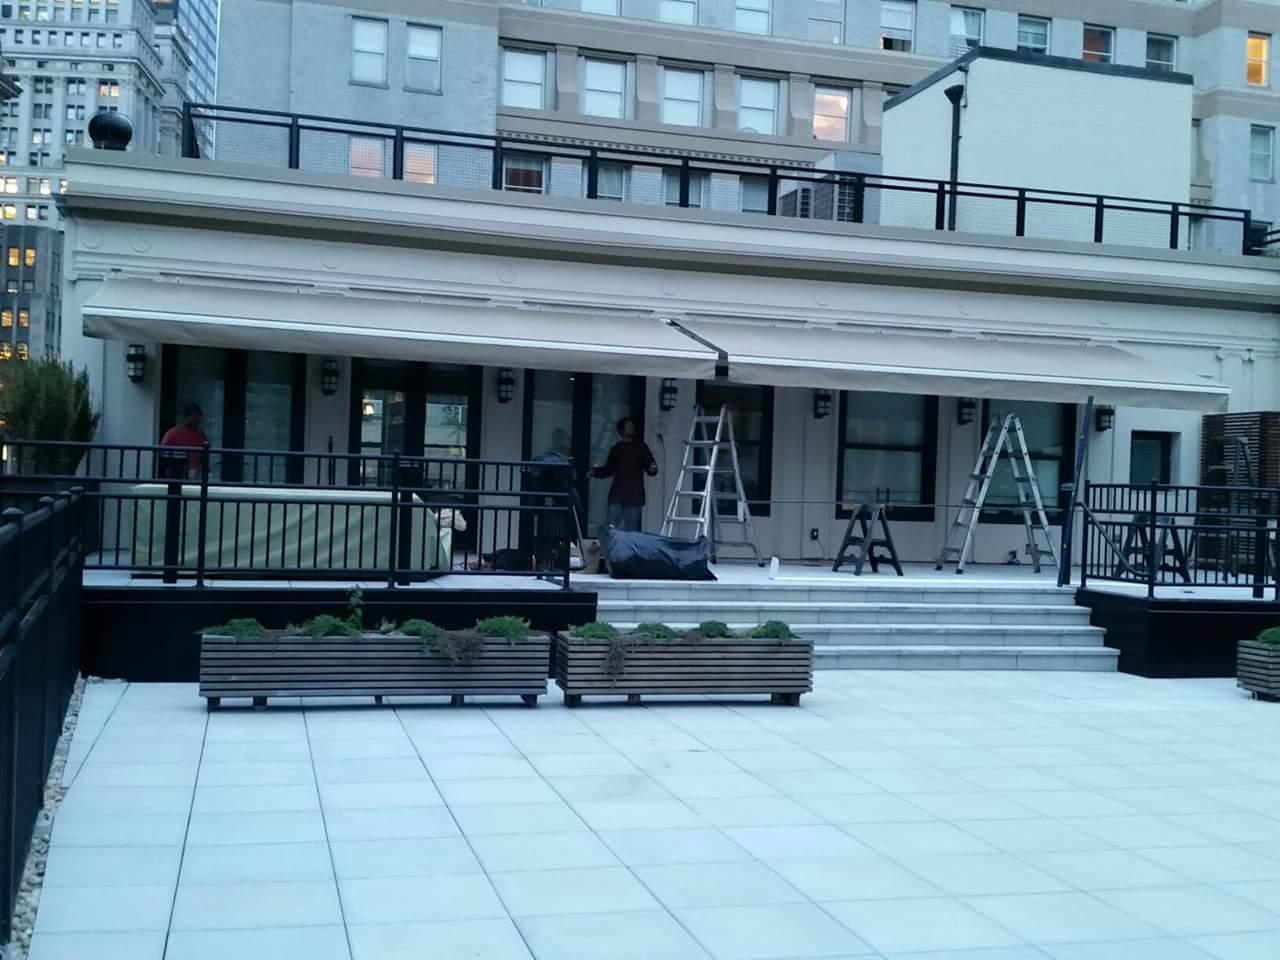 Residential Awnings - Awnings New York | New York City ...